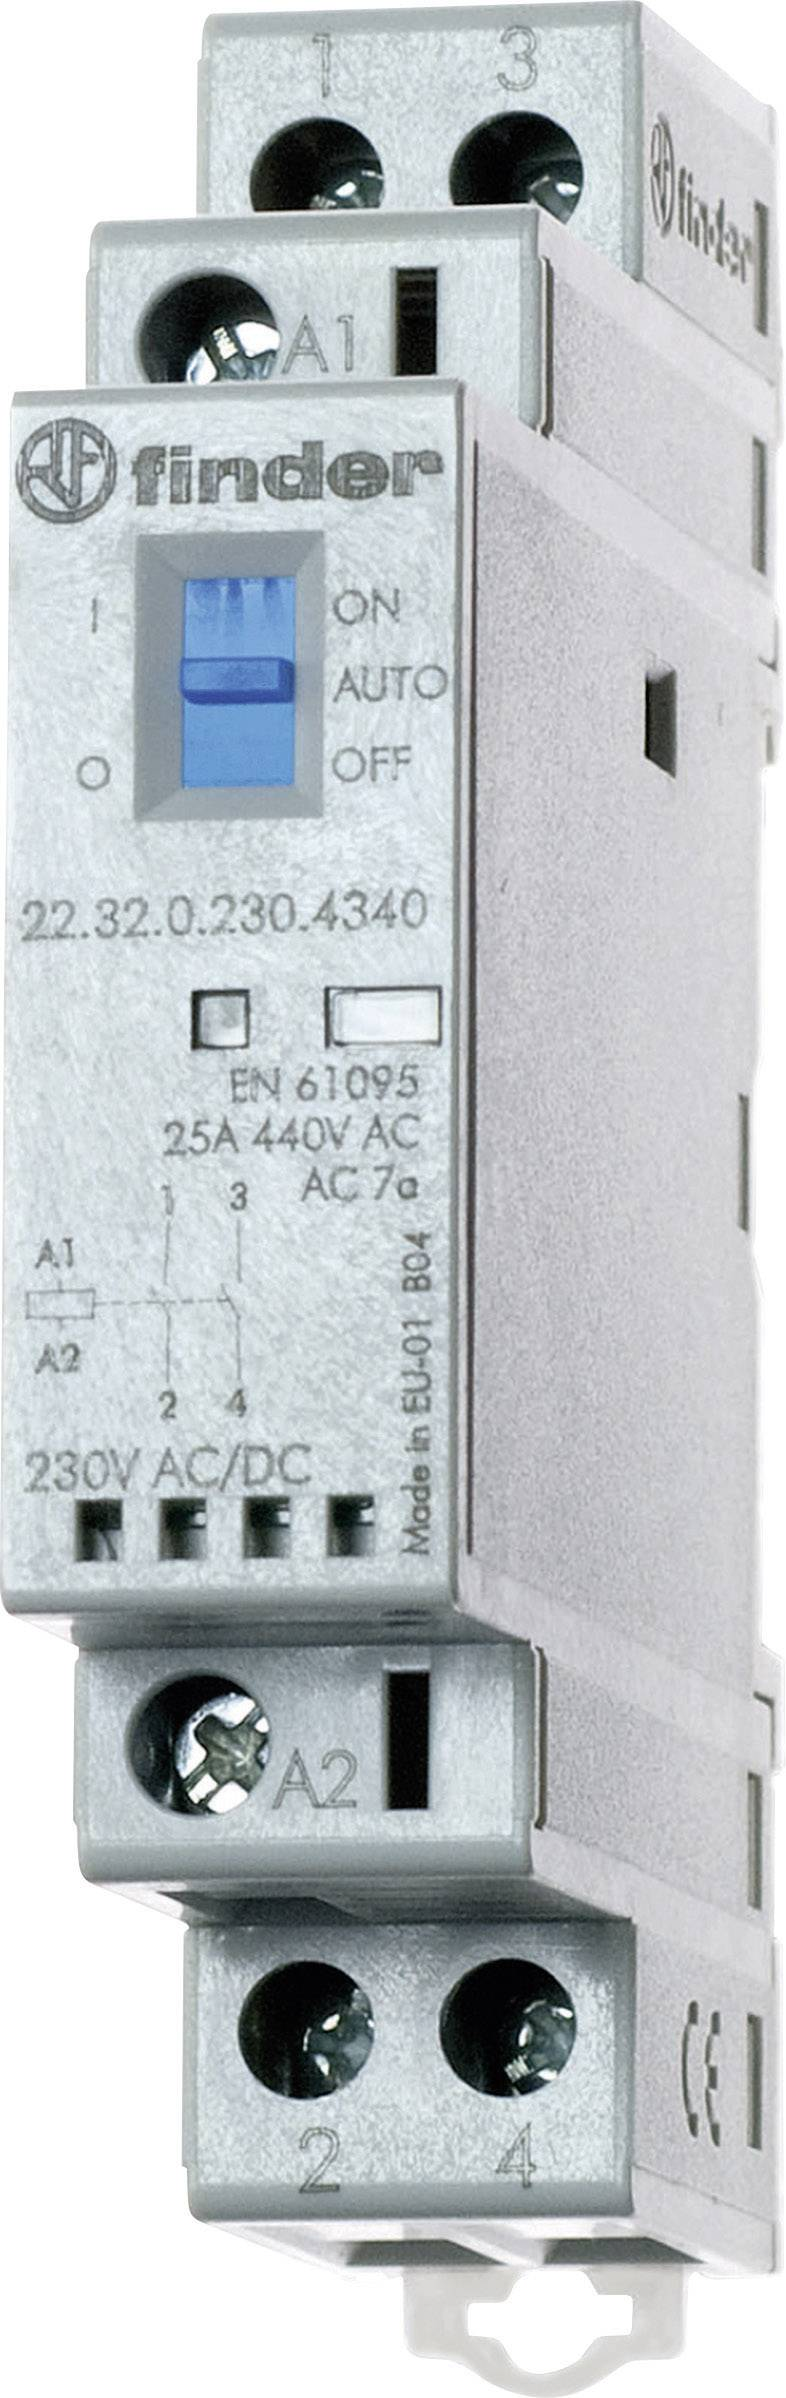 Stykač Finder 22.32.0.230.1540, 230 V/DC, 230 V/AC, 25 A, 1 ks